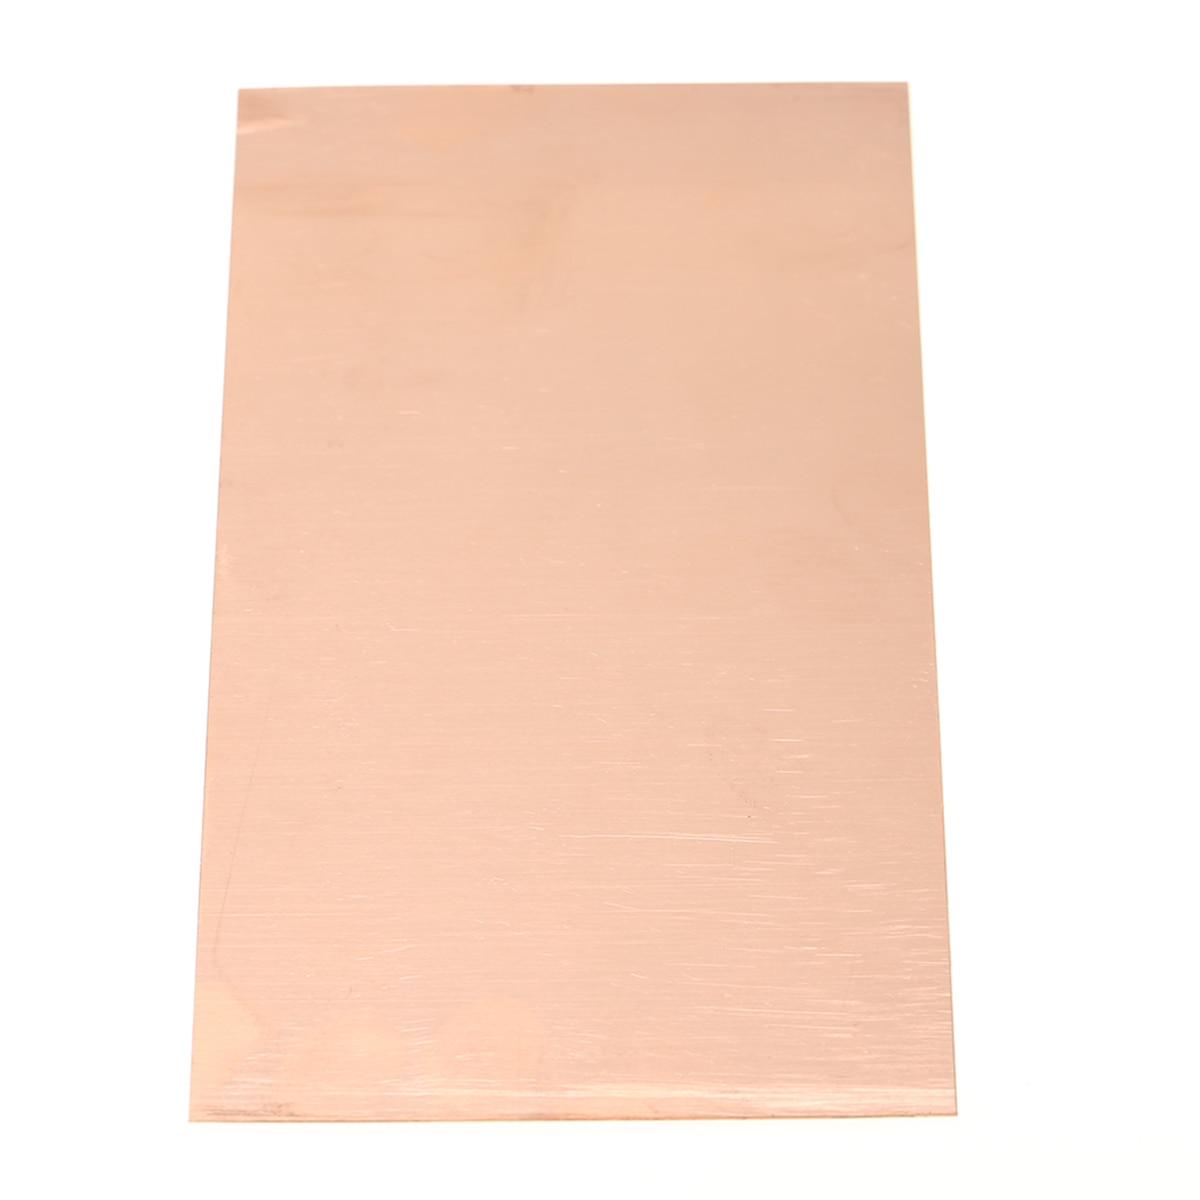 1pc High Purity Copper Cu Metal Sheet Plate Foil Panel 100x200x0.5mm Mayitr For Power Tool 1sheet matte surface 3k 100% carbon fiber plate sheet 2mm thickness